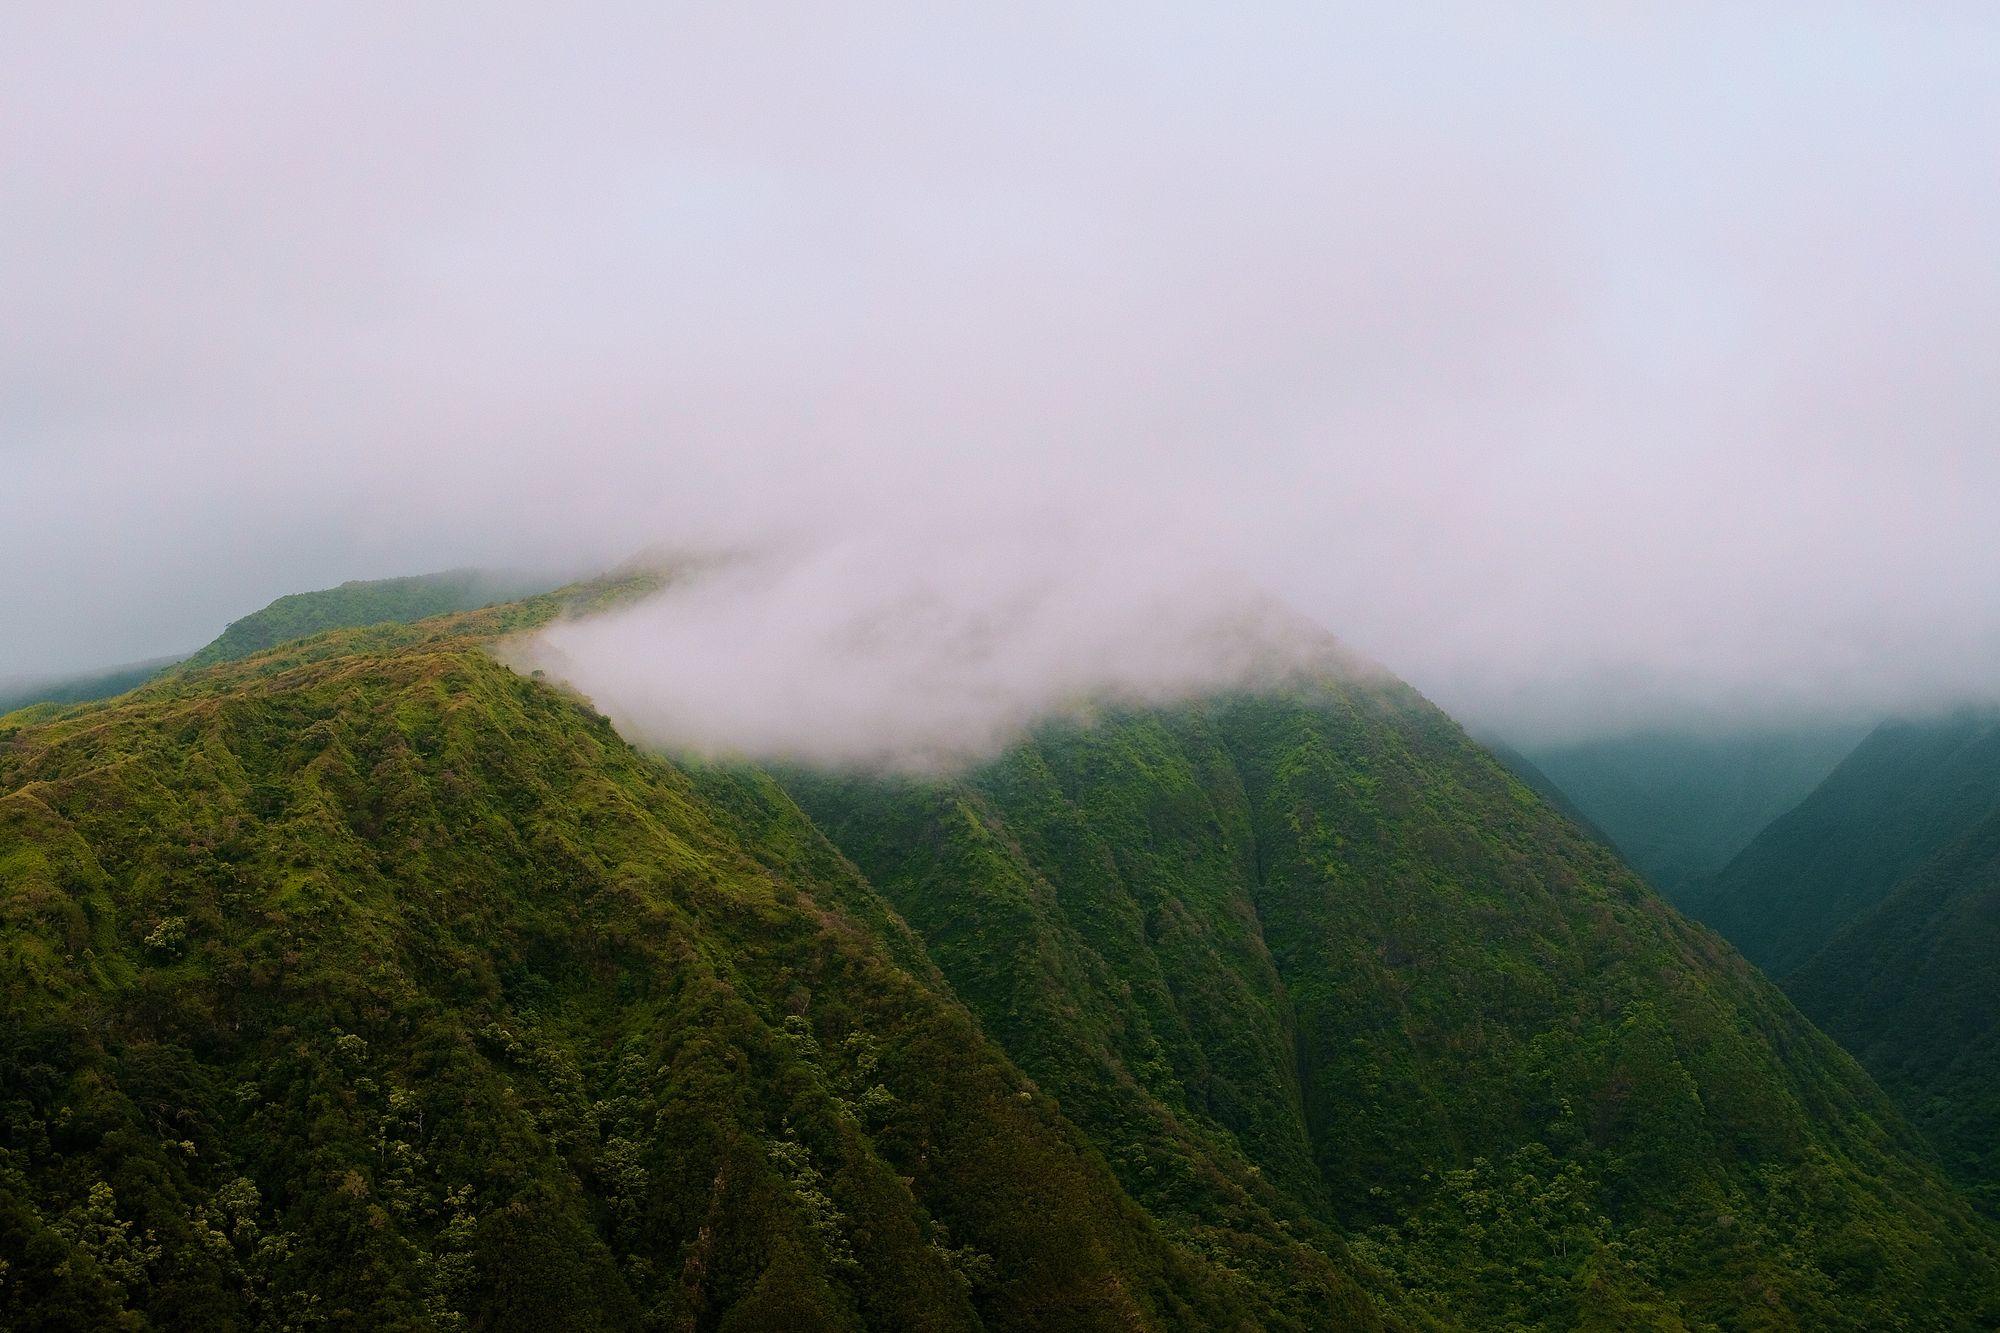 pixelwaves hawaii green mountain clouds forrest tree maui pixelwaves.net